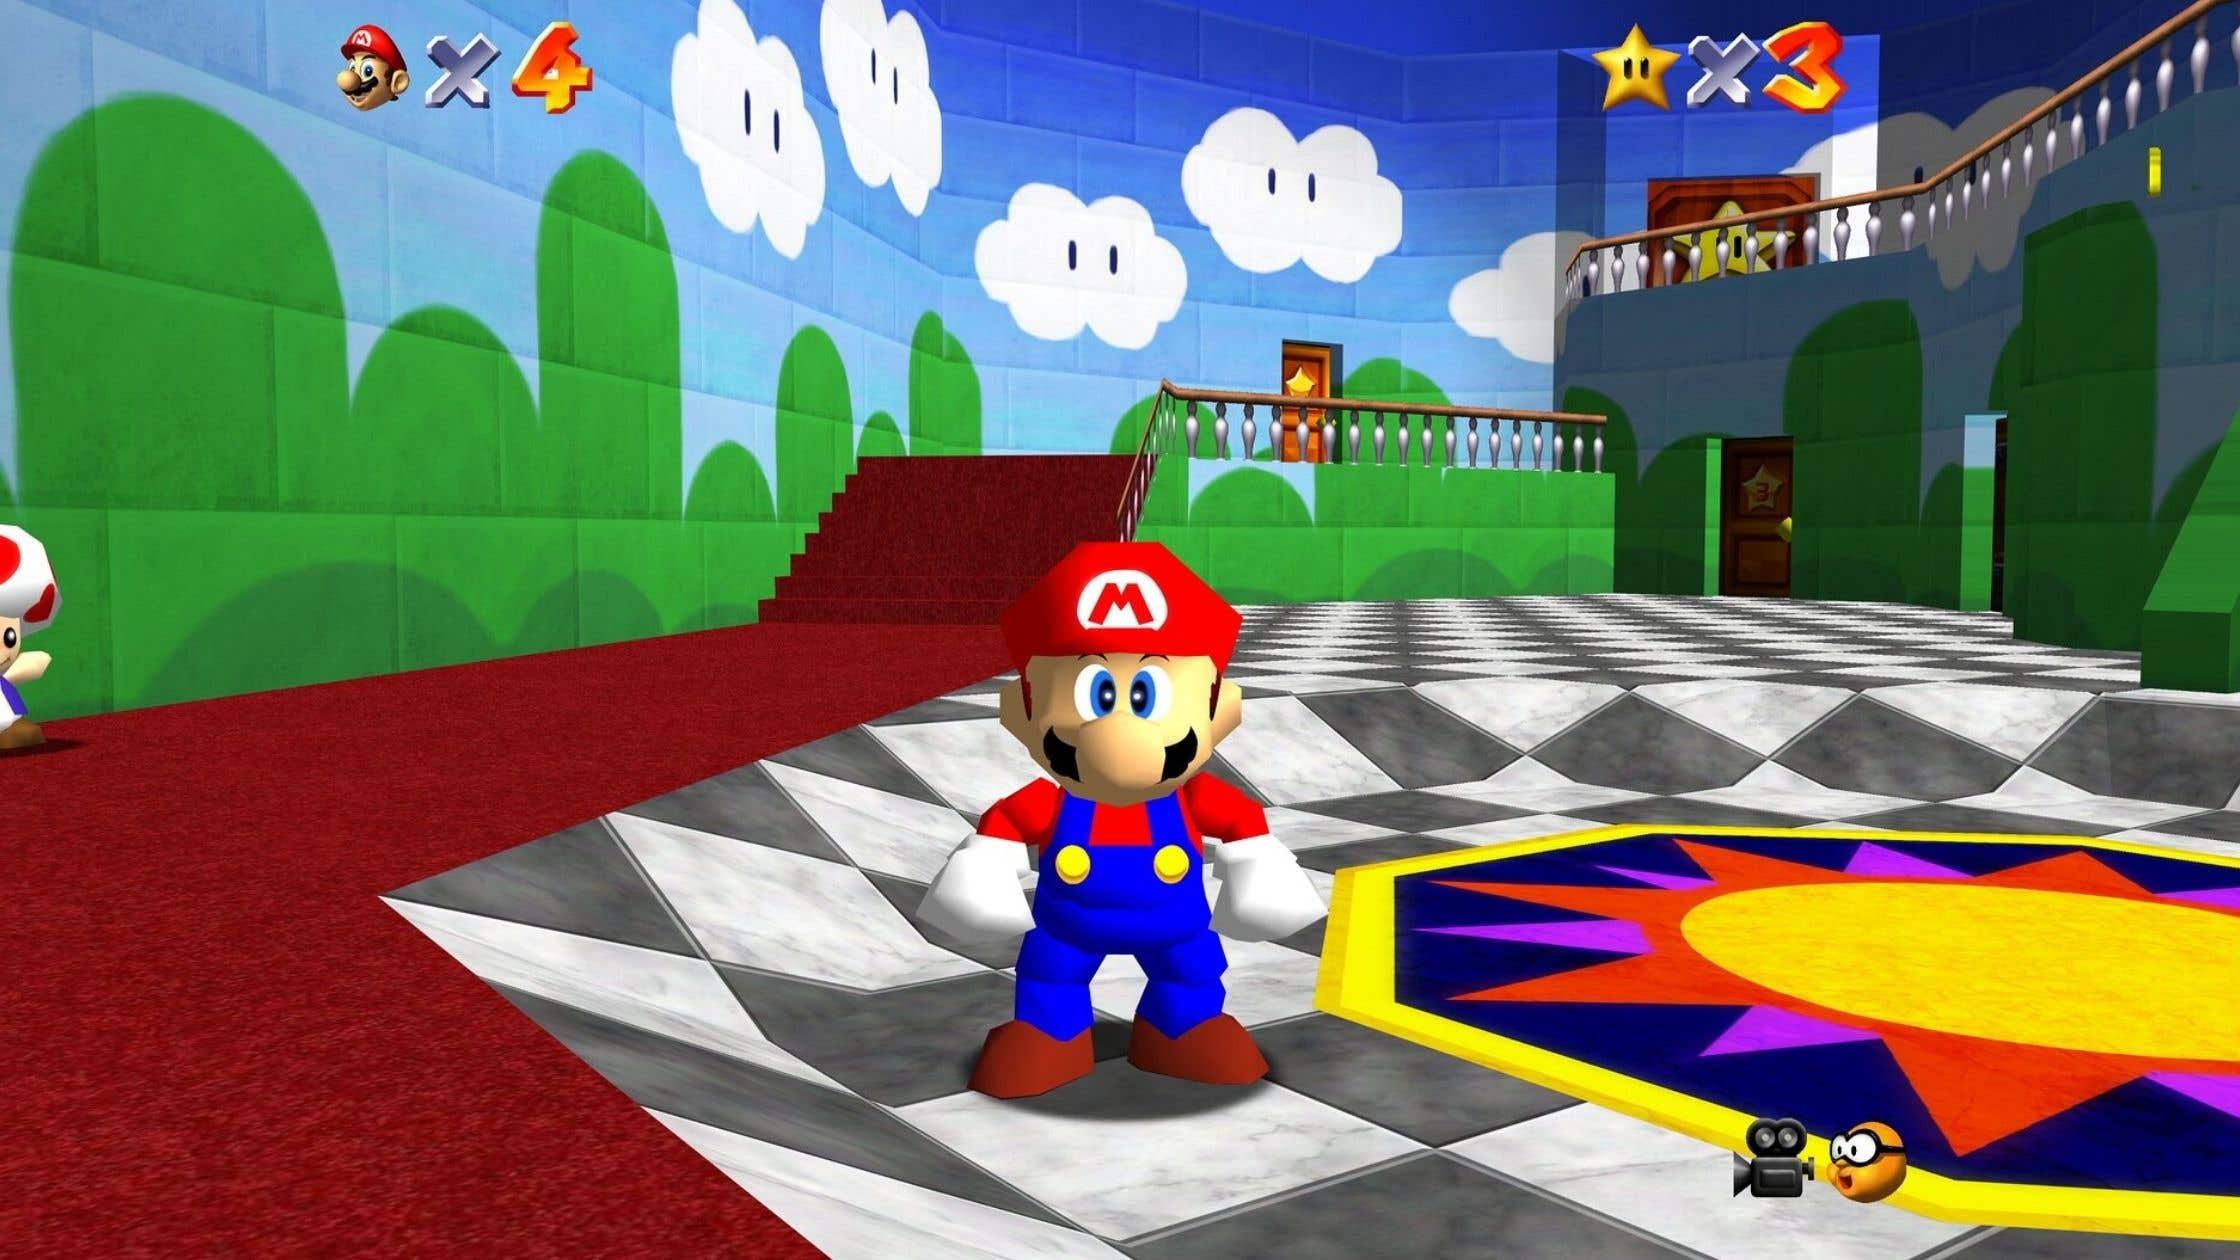 Mario 64 low poly art